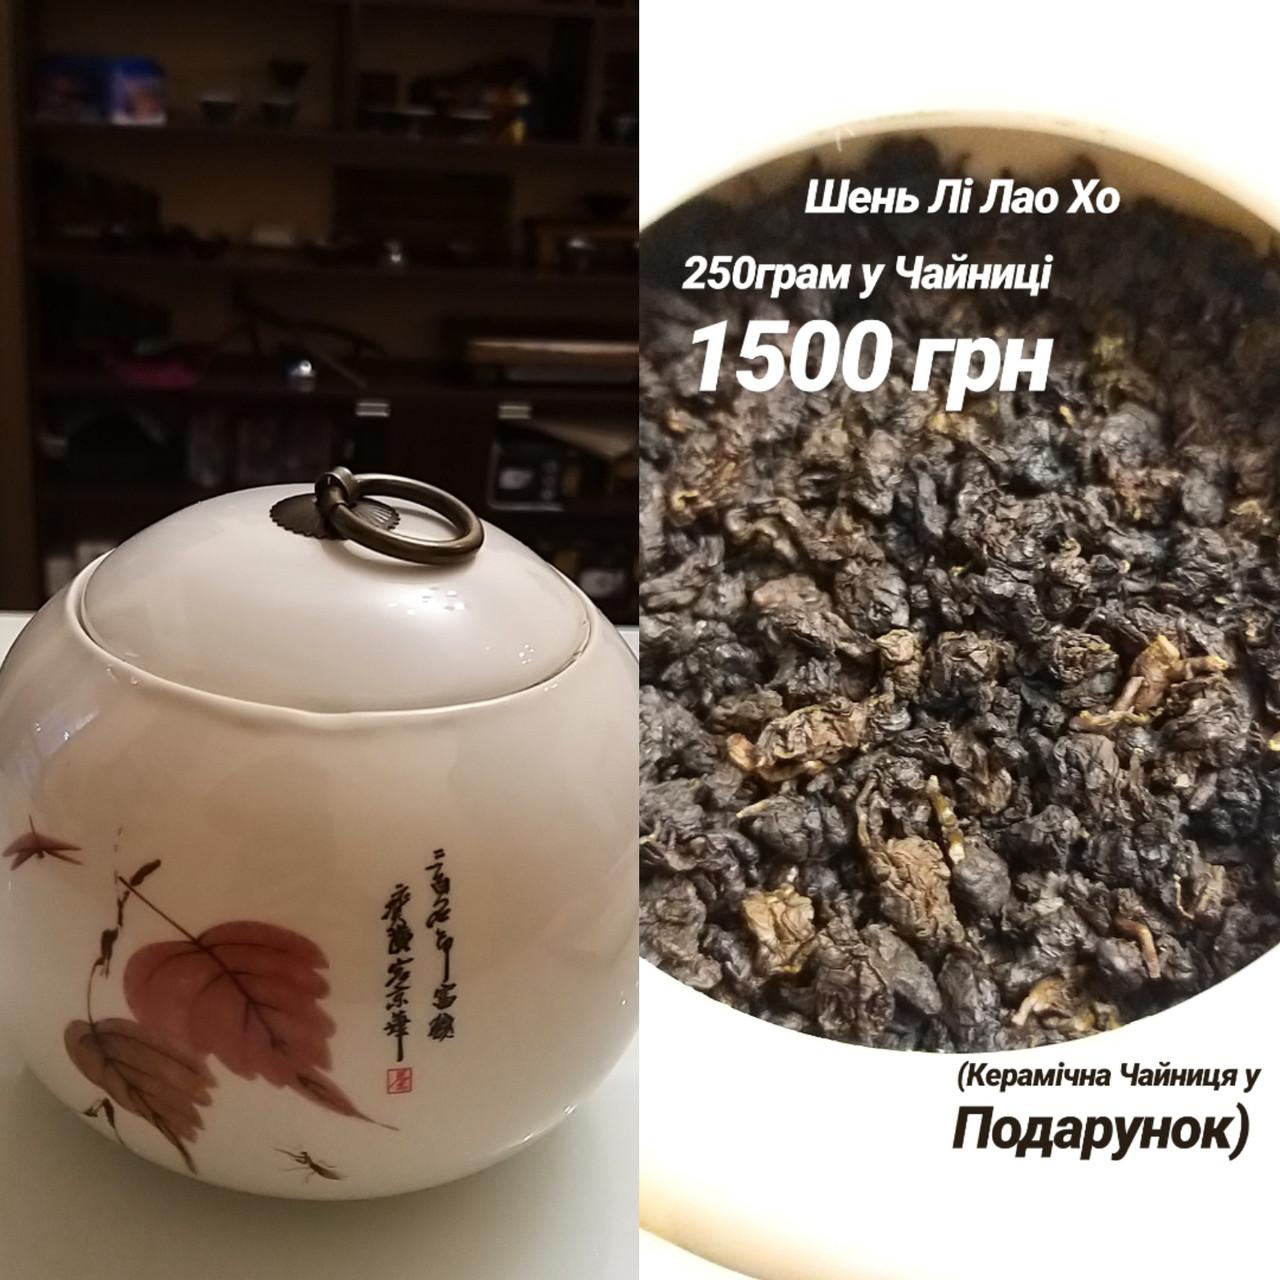 Шэнь Ли Лао Хо в чайнице, 250 гр